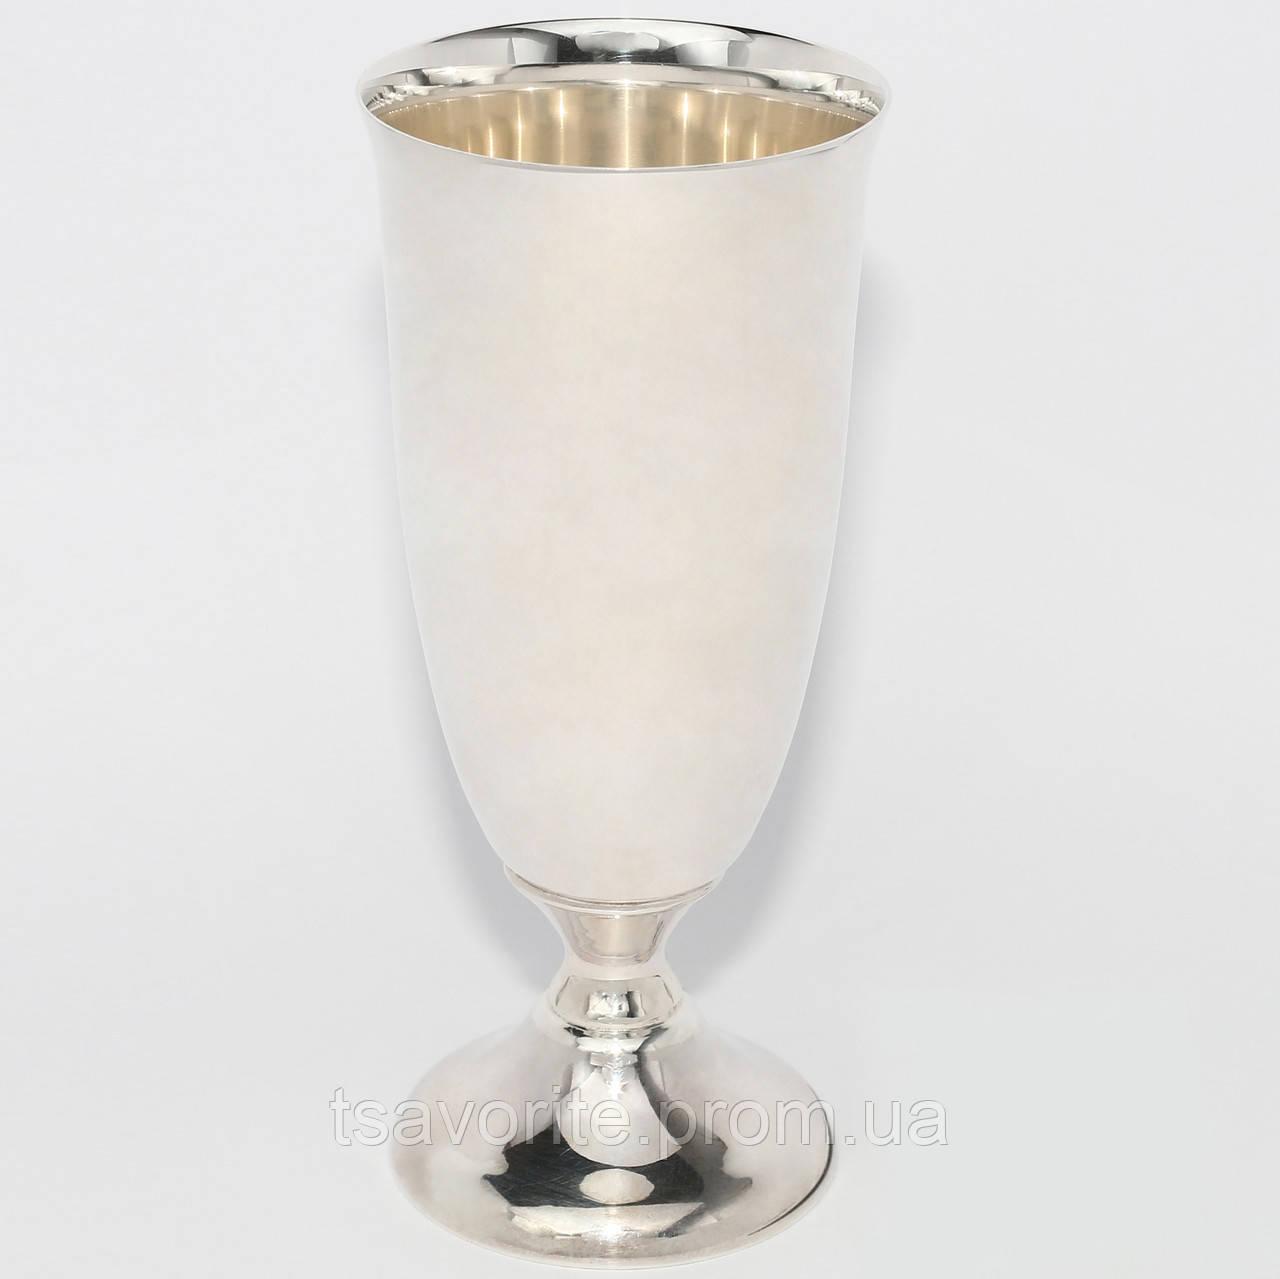 Серебряная рюмка 11ДЛ